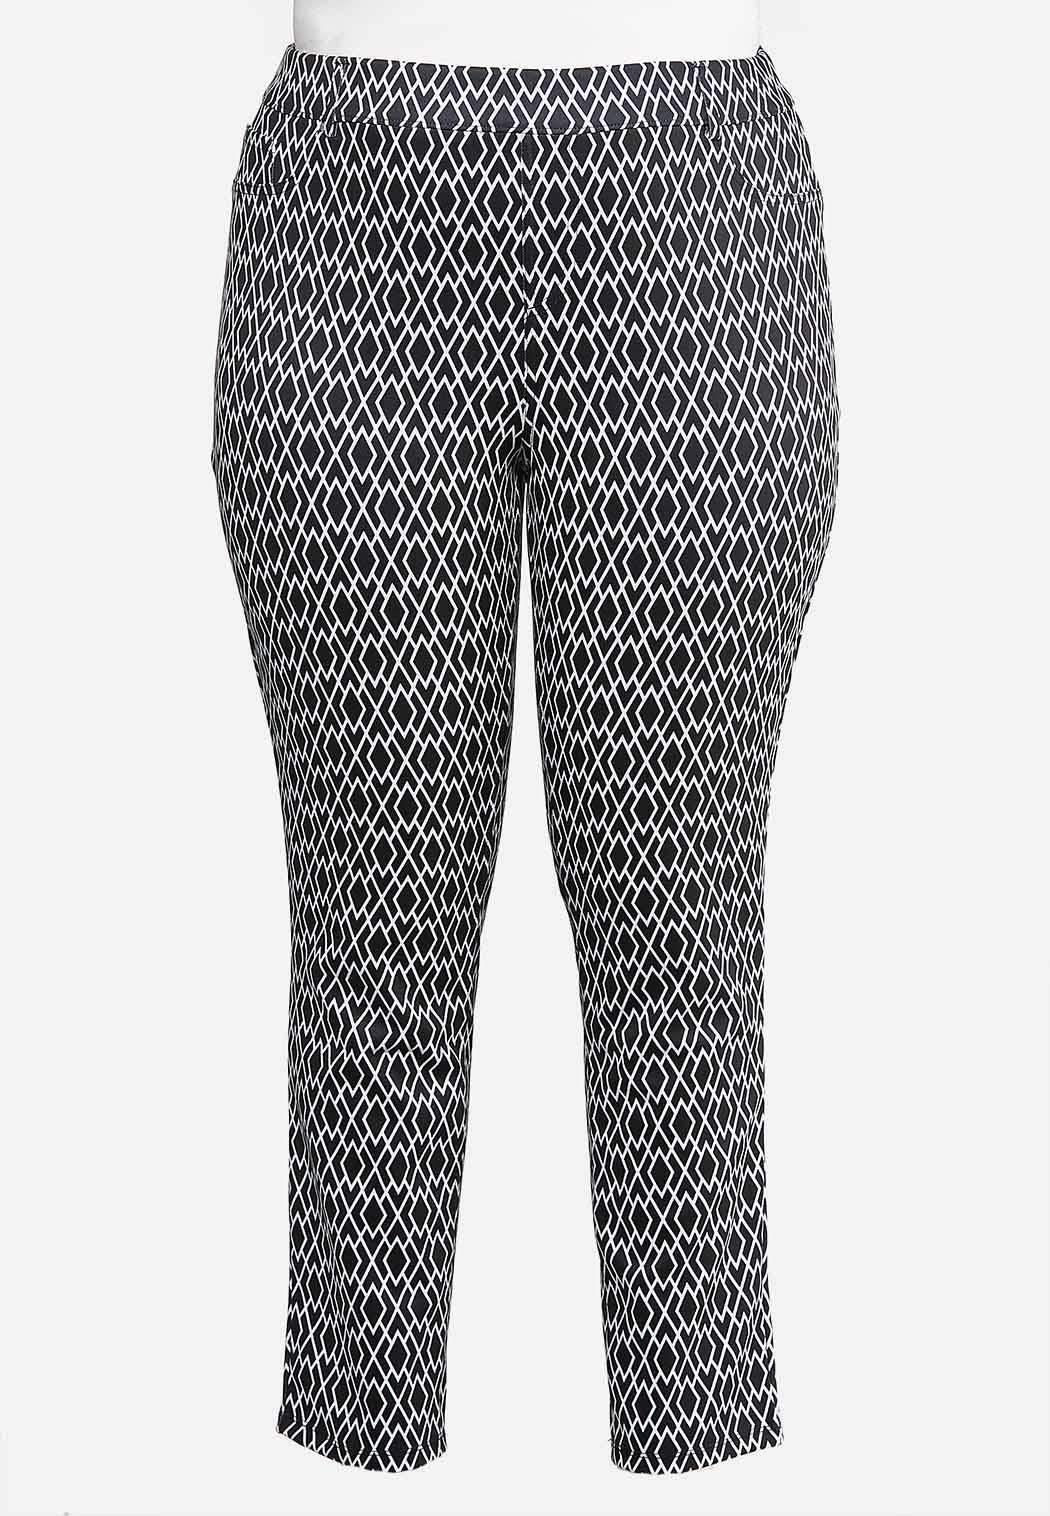 2fdcfe8c38 Women's Plus Size Pants